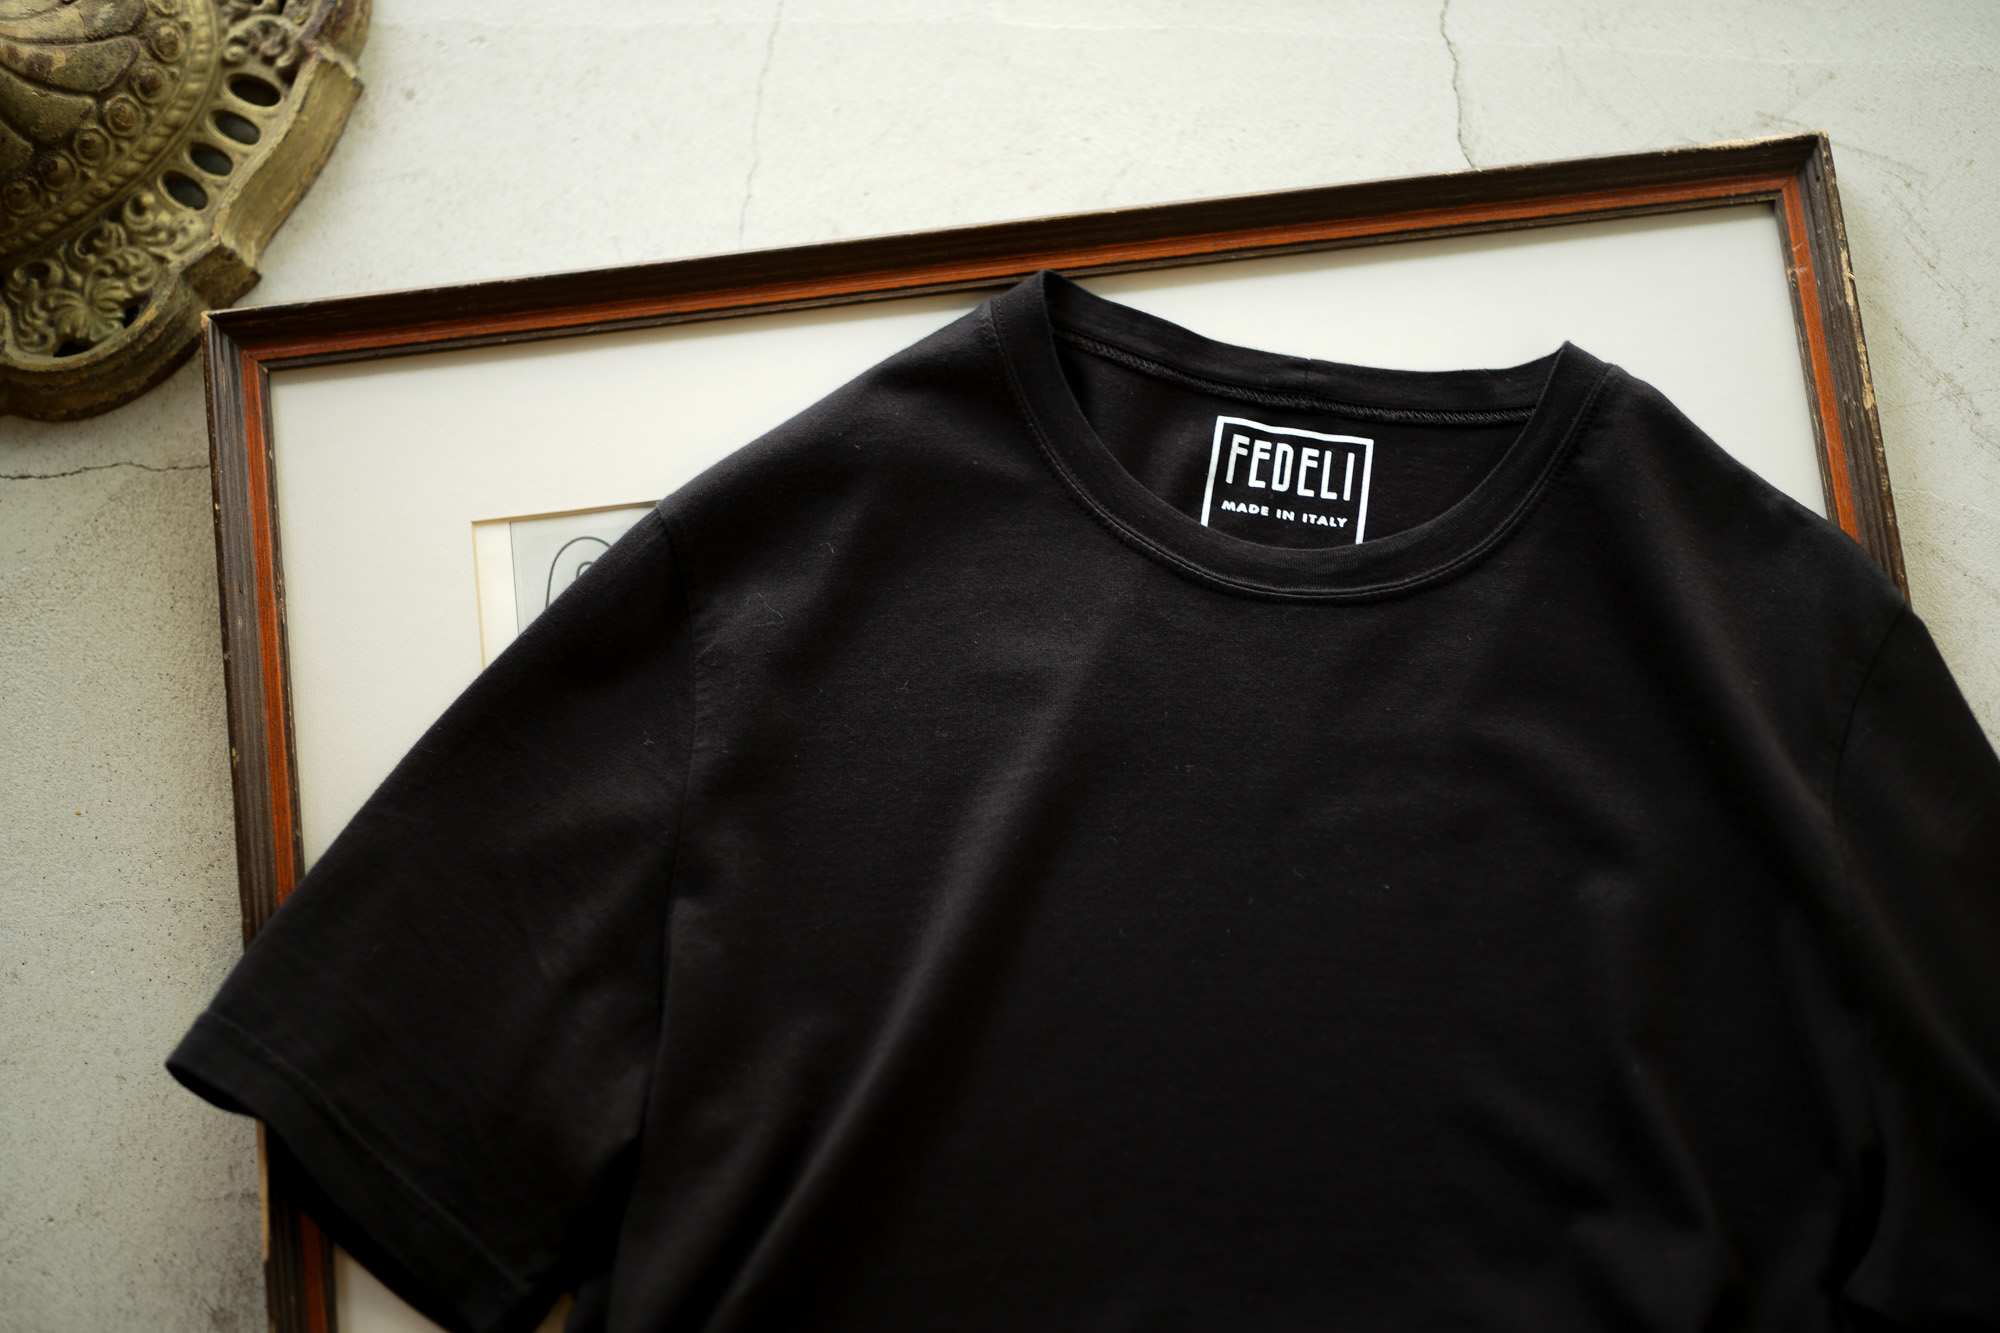 FEDELI(フェデリ) Crew Neck T-shirt (クルーネック Tシャツ) ギザコットン Tシャツ BLACK (ブラック・36) made in italy (イタリア製) 2022 春夏 【Special Color】【ご予約開始】愛知 名古屋 Alto e Diritto altoediritto アルトエデリット 黒Tシャツ